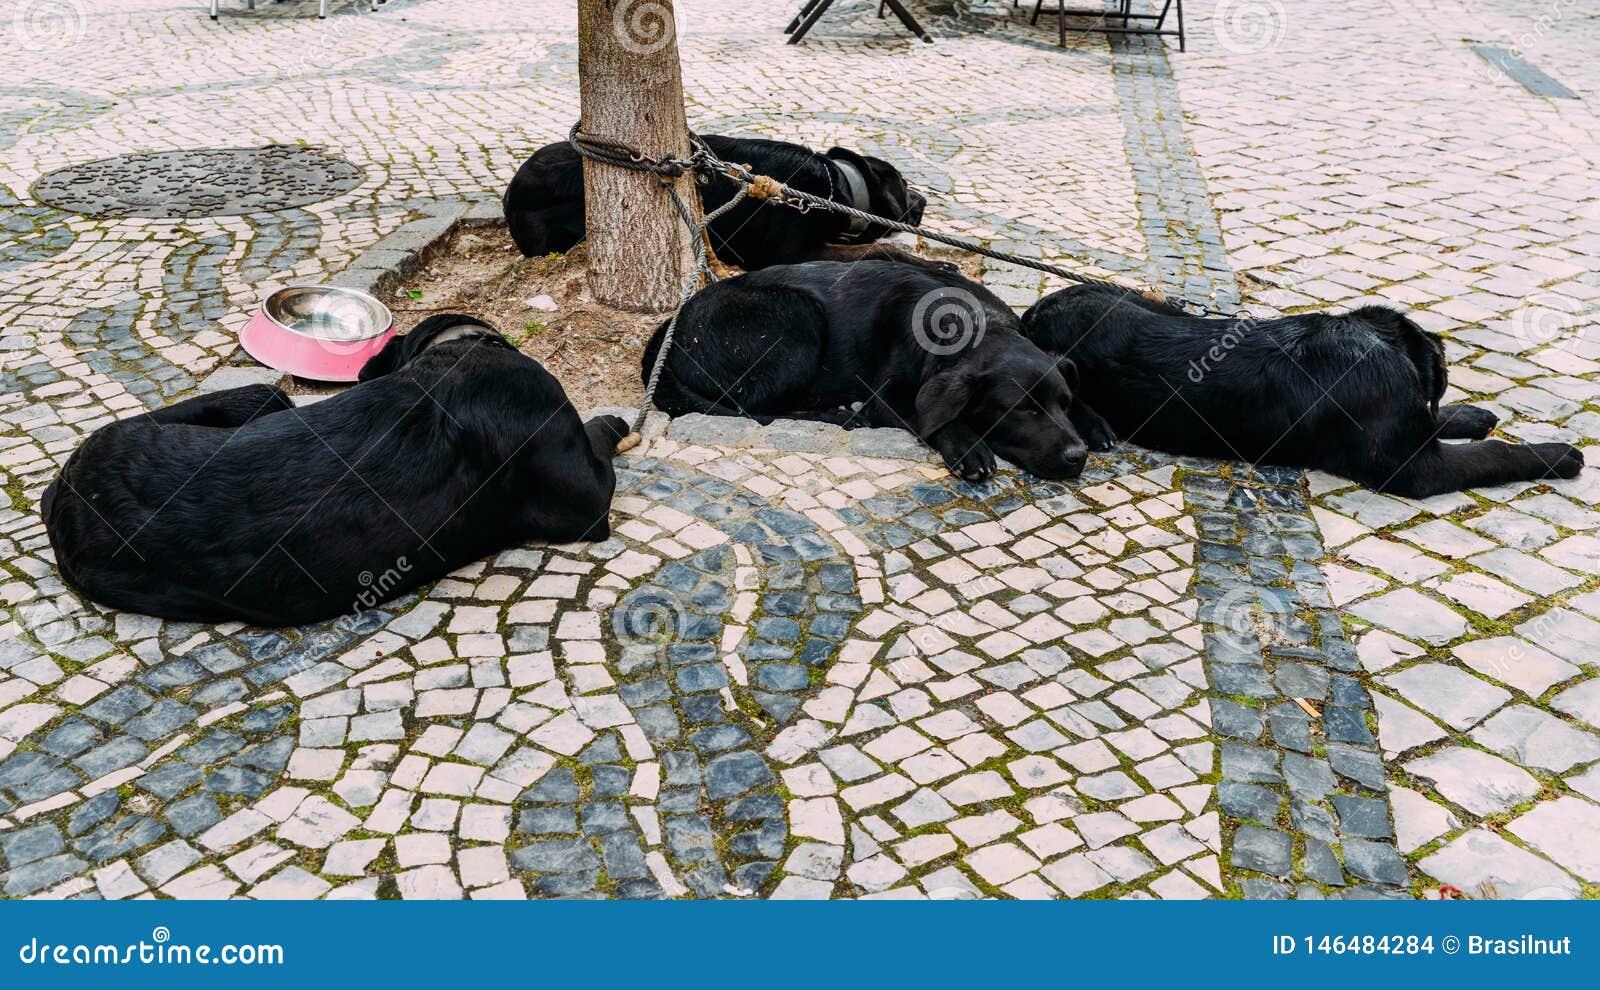 10,10 Dogs Asleep Photos   Free & Royalty Free Stock Photos from ...